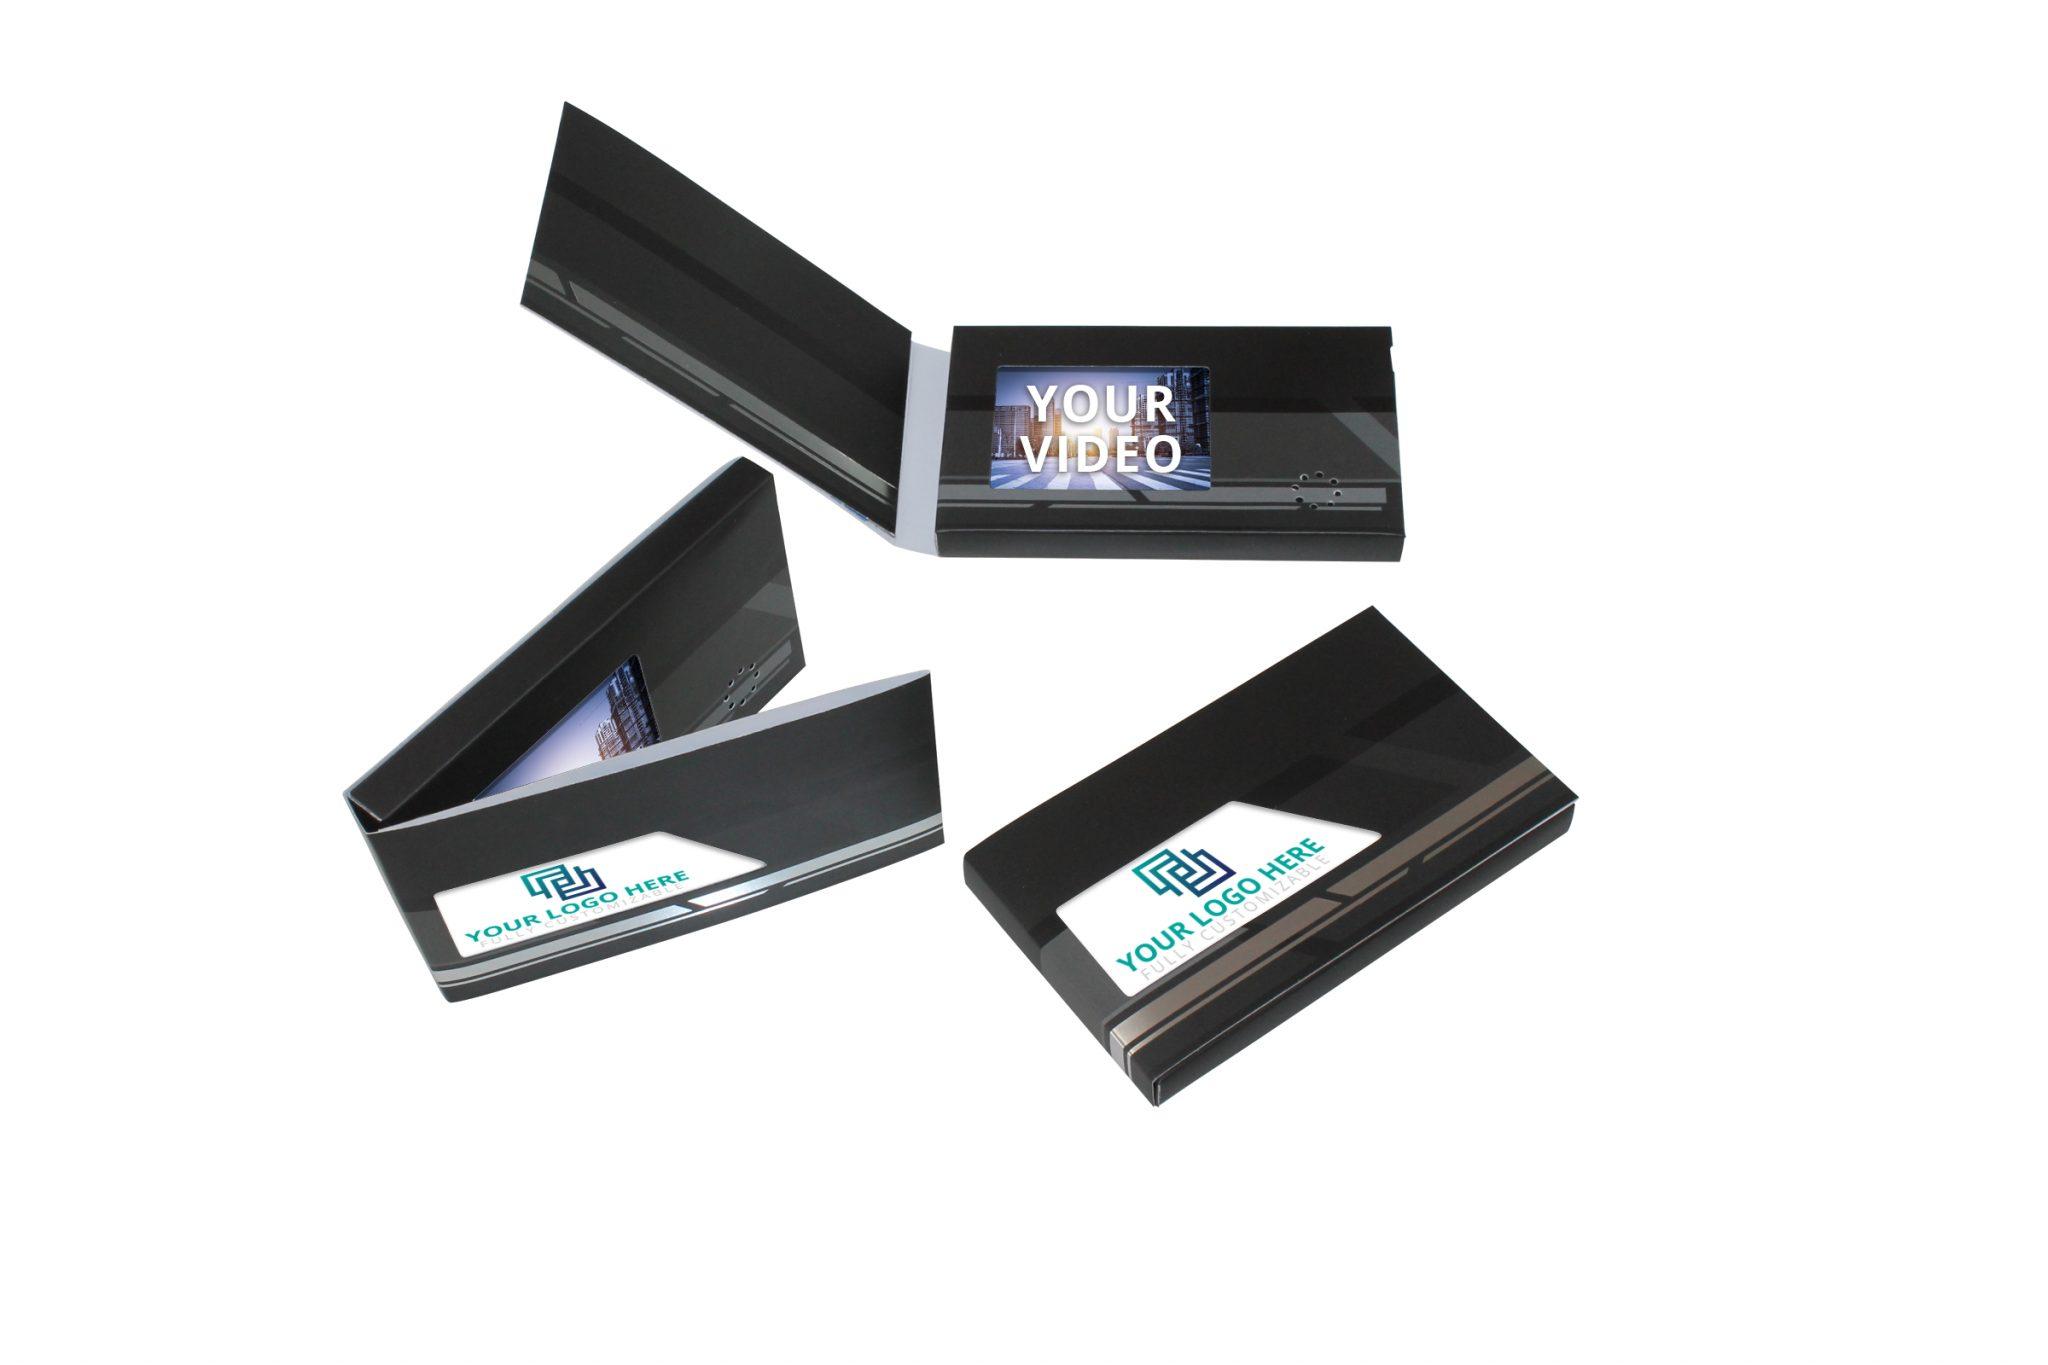 Business Card MediaBuk 3.87 x 2 Screen size 2.4